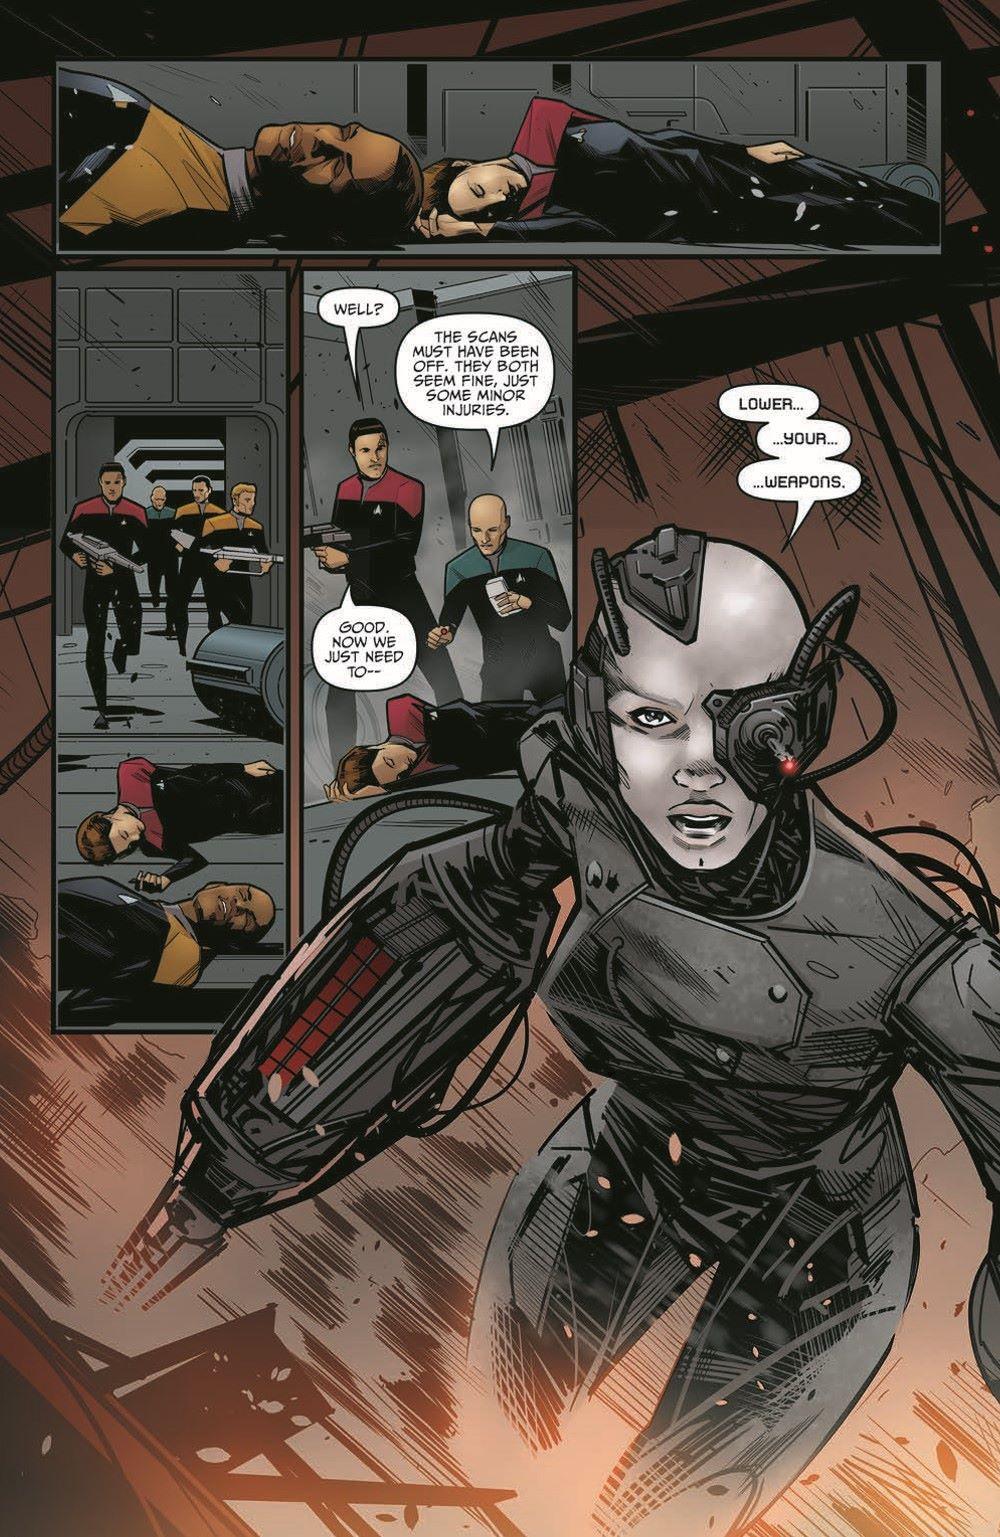 ST_Voyager_SR01-pr-3 ComicList Previews: STAR TREK VOYAGER SEVEN'S RECKONING #1 (OF 4)